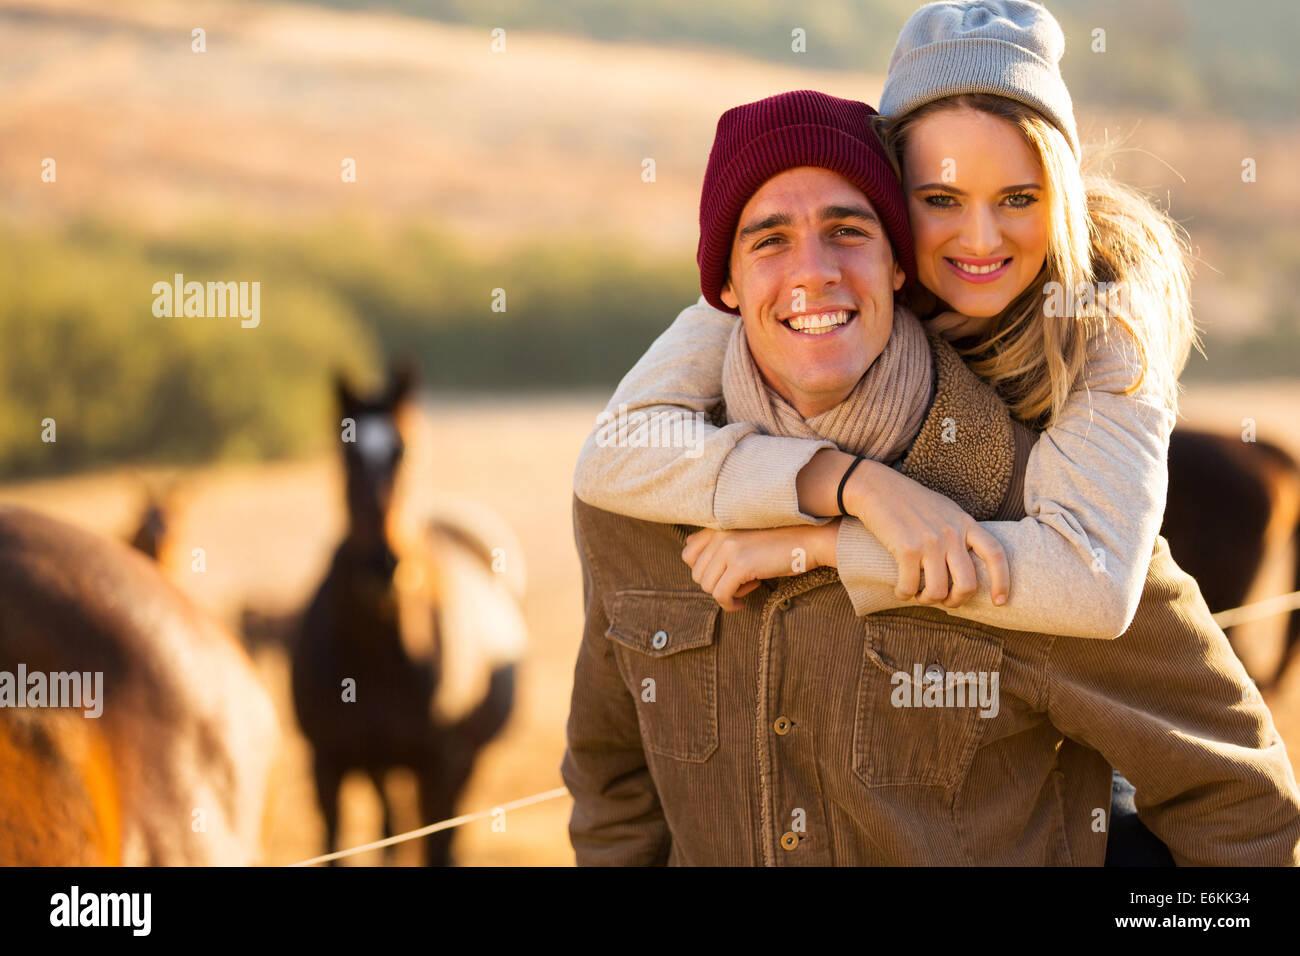 happy woman enjoying piggyback ride on boyfriends back - Stock Image